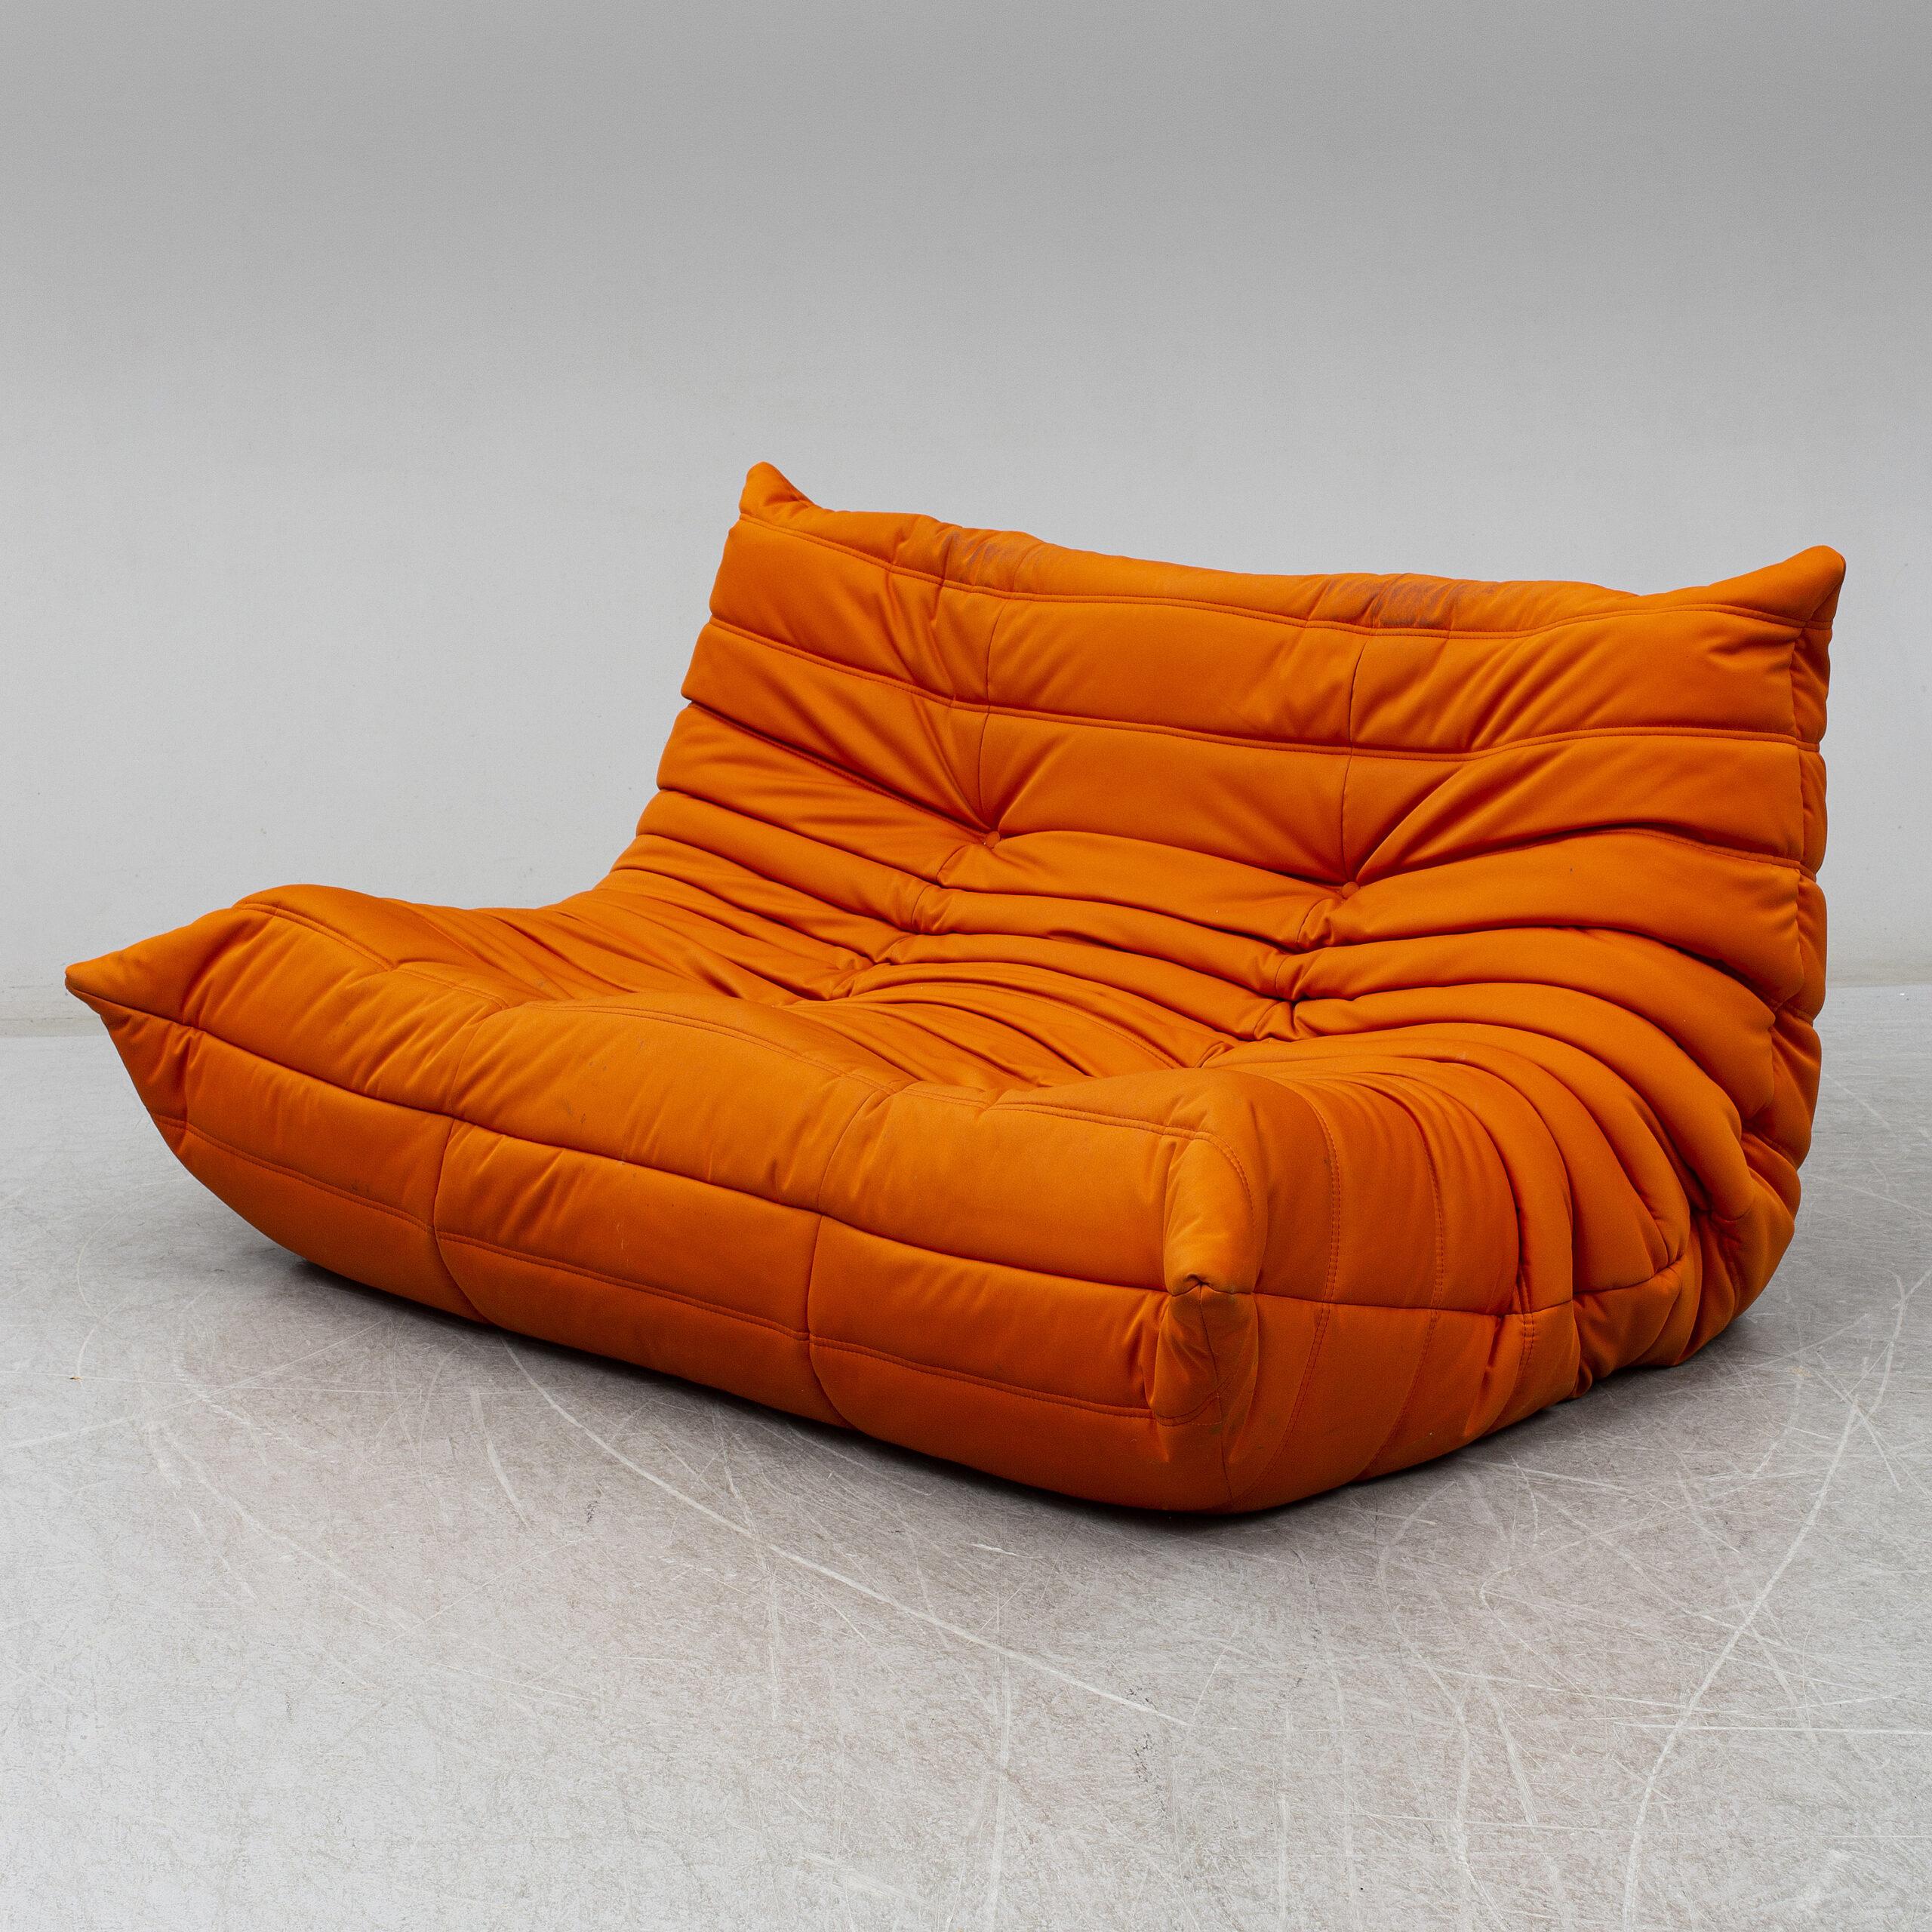 Full Size of Ligne Roset Togo A Michel Ducaroy Lounge Chair Sofa Wohnzimmer Ligne Roset Togo